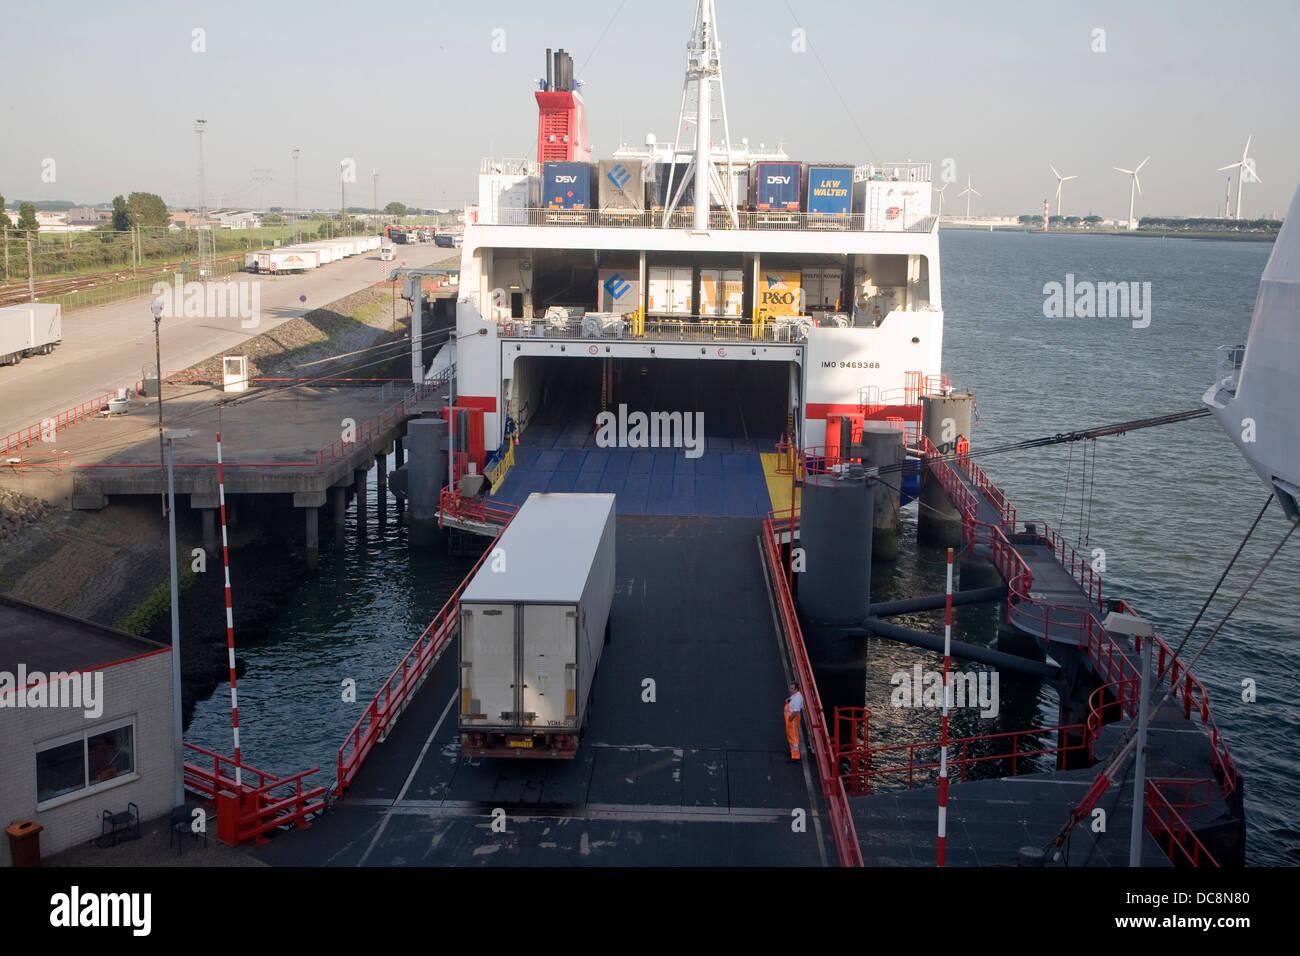 Ro-ro vehicle freight ferry HGV vehicles loading unloading Hoek van Holland Netherlands - Stock Image